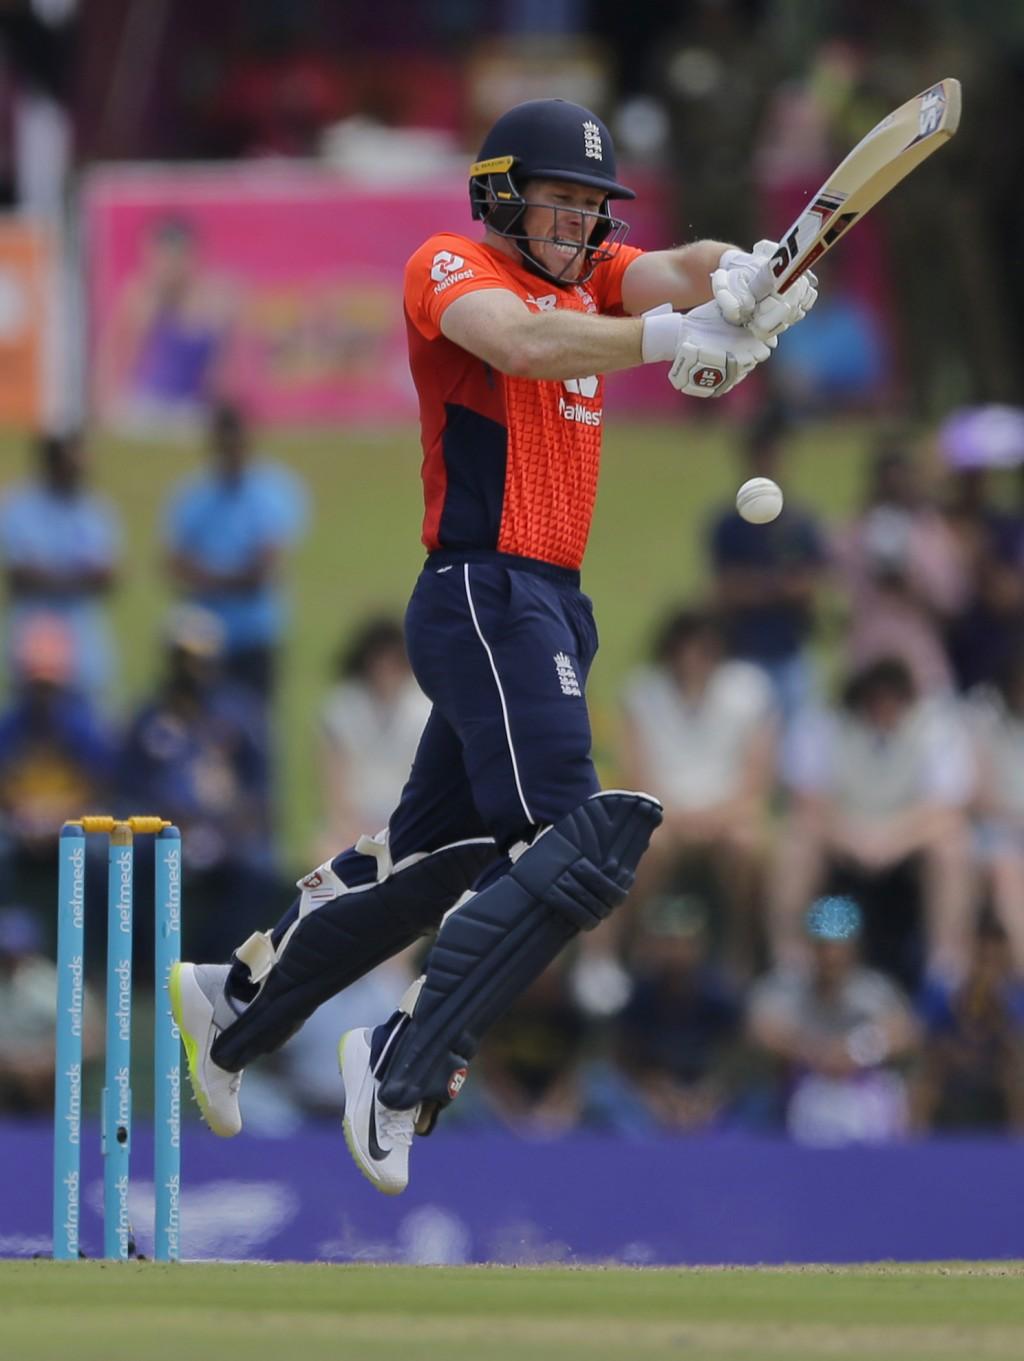 England's Eoin Morgan plays a shot during their second one-day international cricket match with Sri Lanka in Dambulla, Sri Lanka, Saturday, Oct. 13, 2